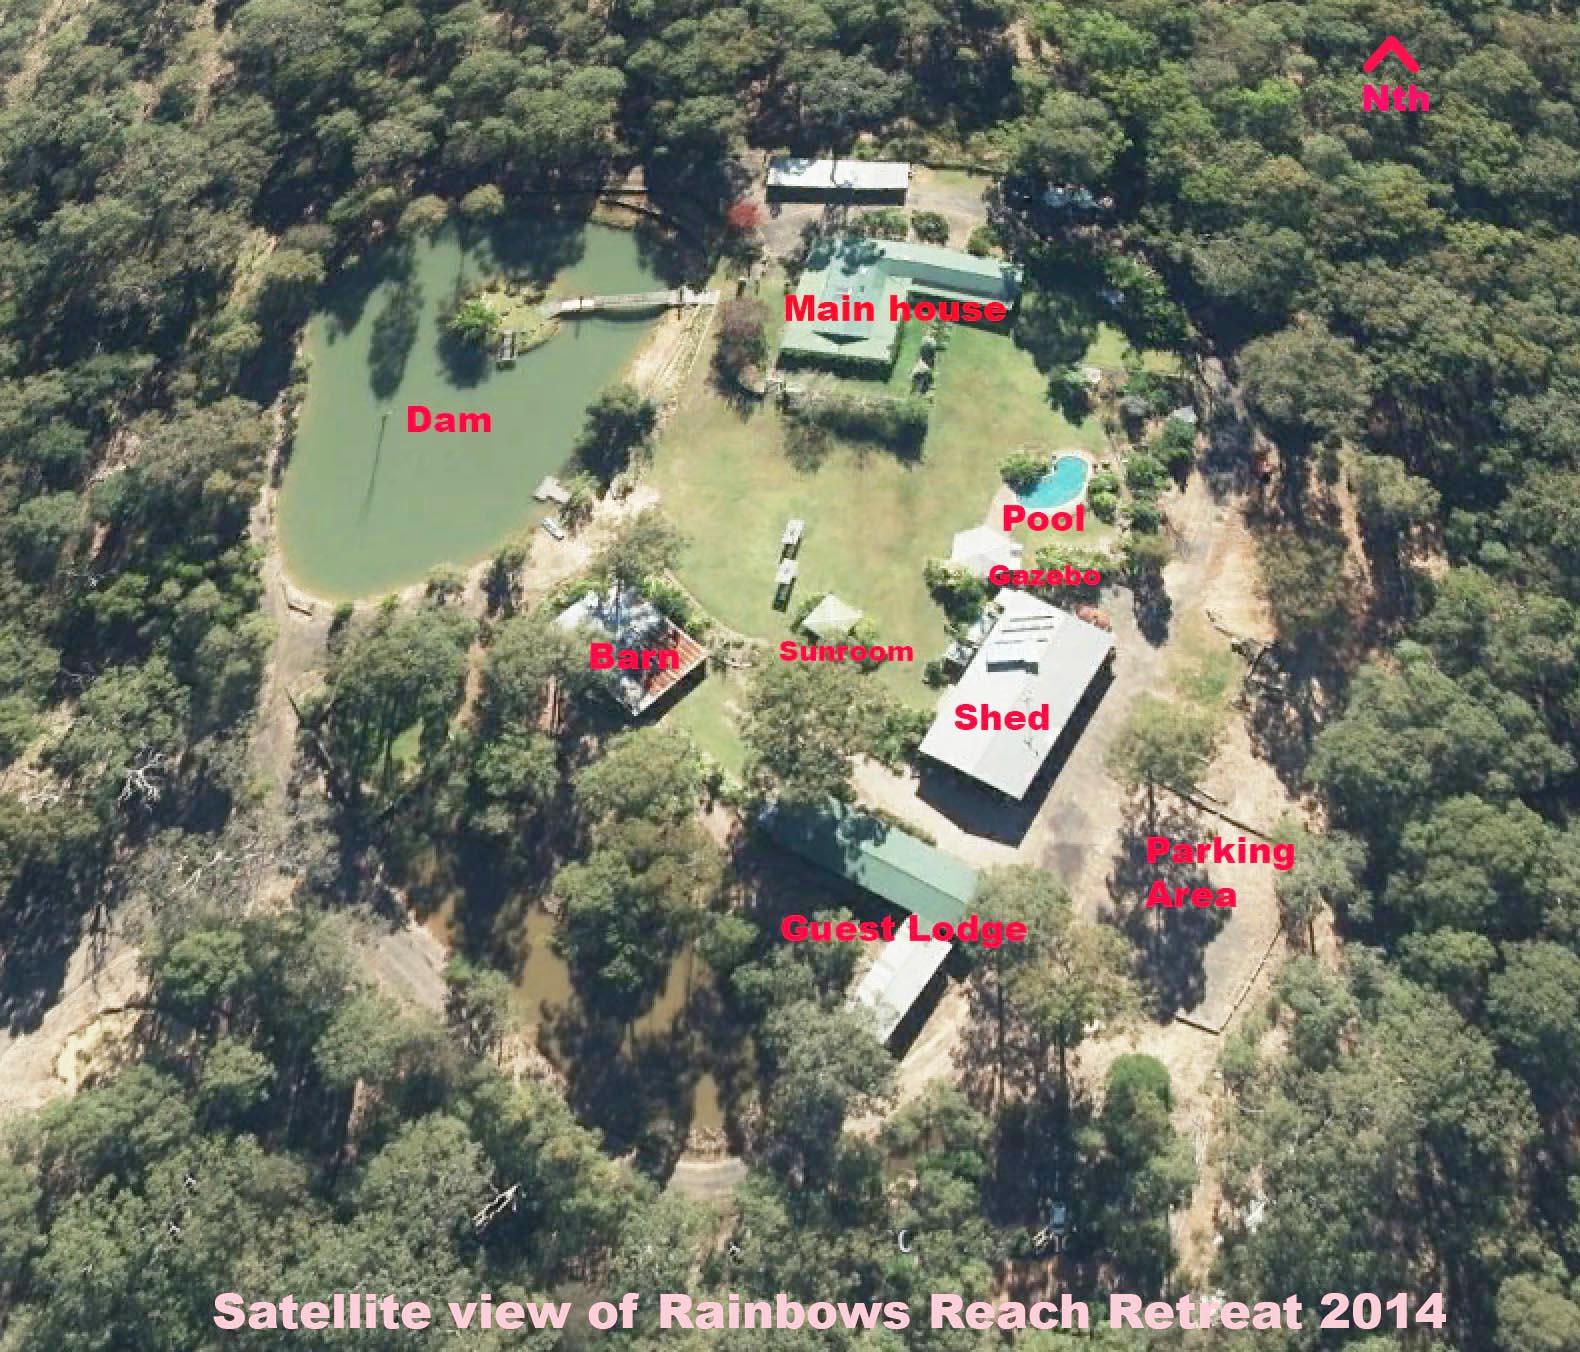 Aerial-google RRR view